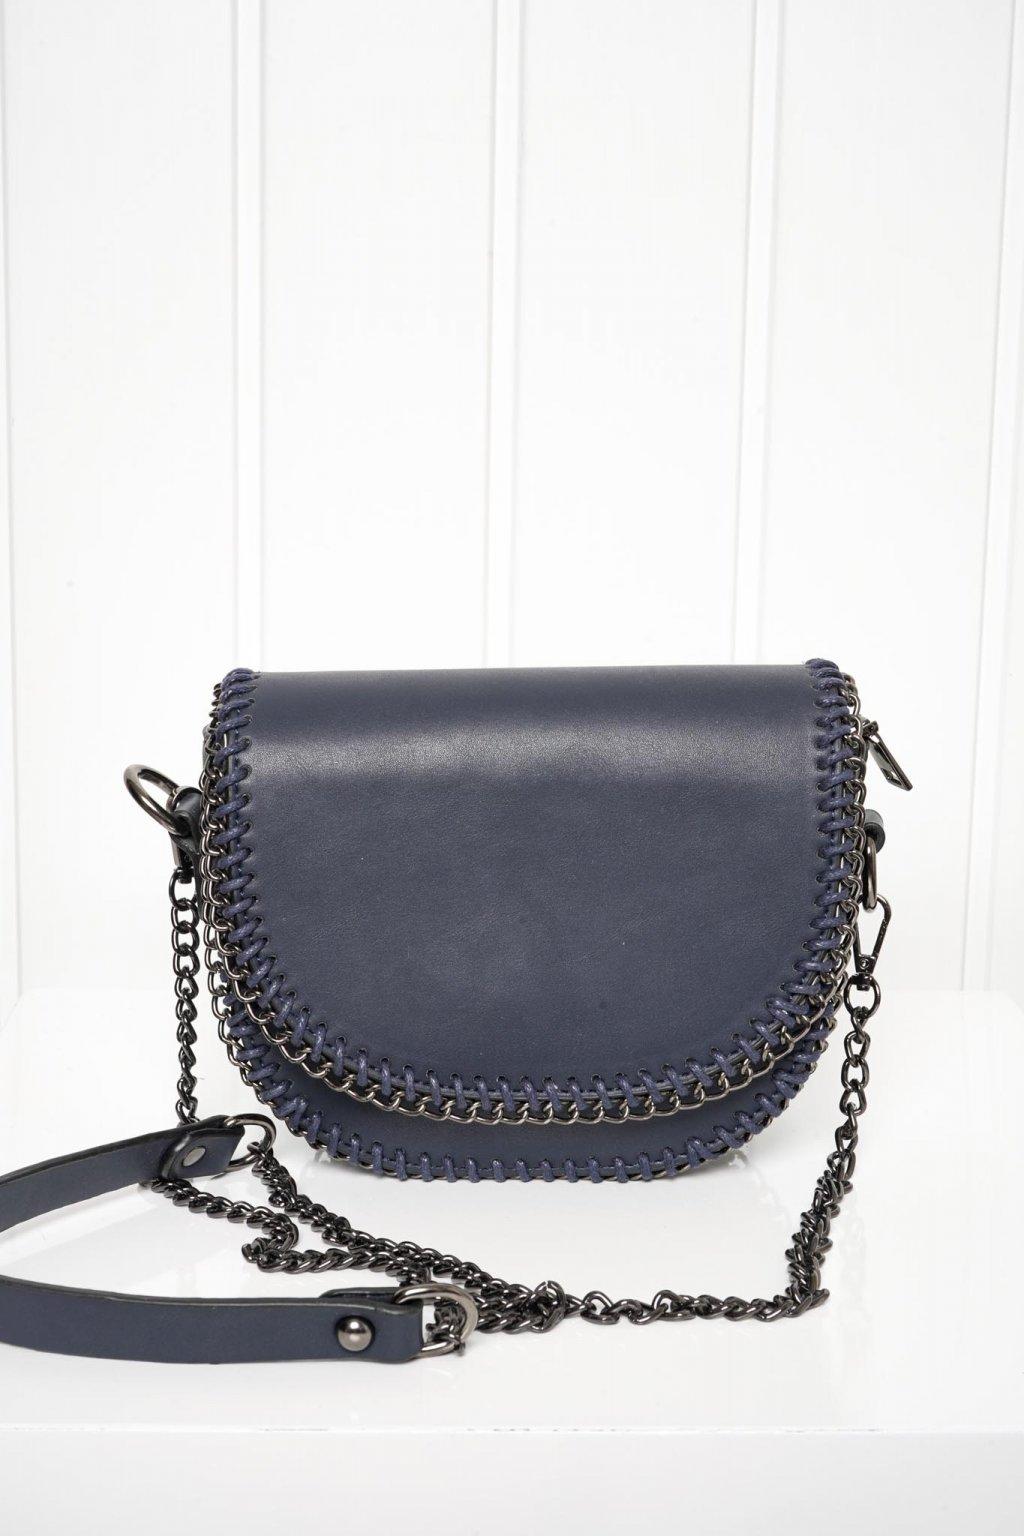 Kabelka, crossbody, ruksak, shopping bag, shopperka, 089